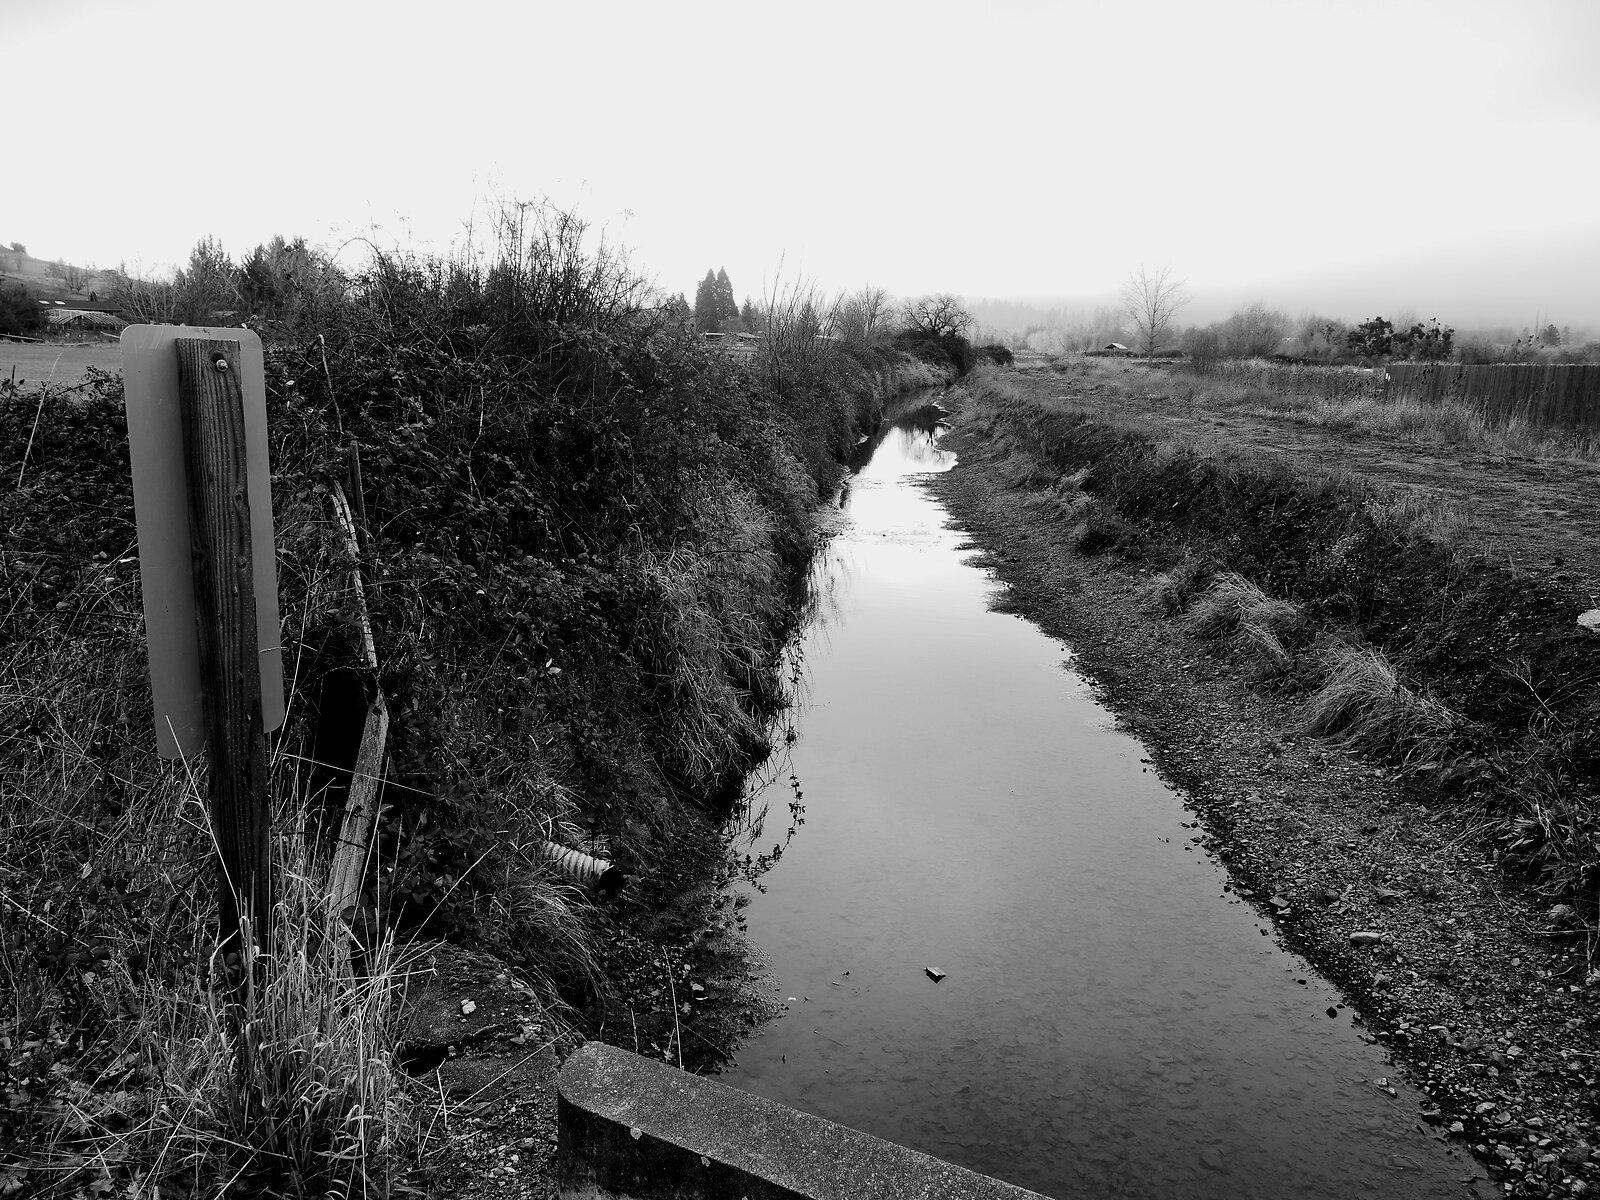 GX8_Jan18_21_irrigation_ditch.jpg